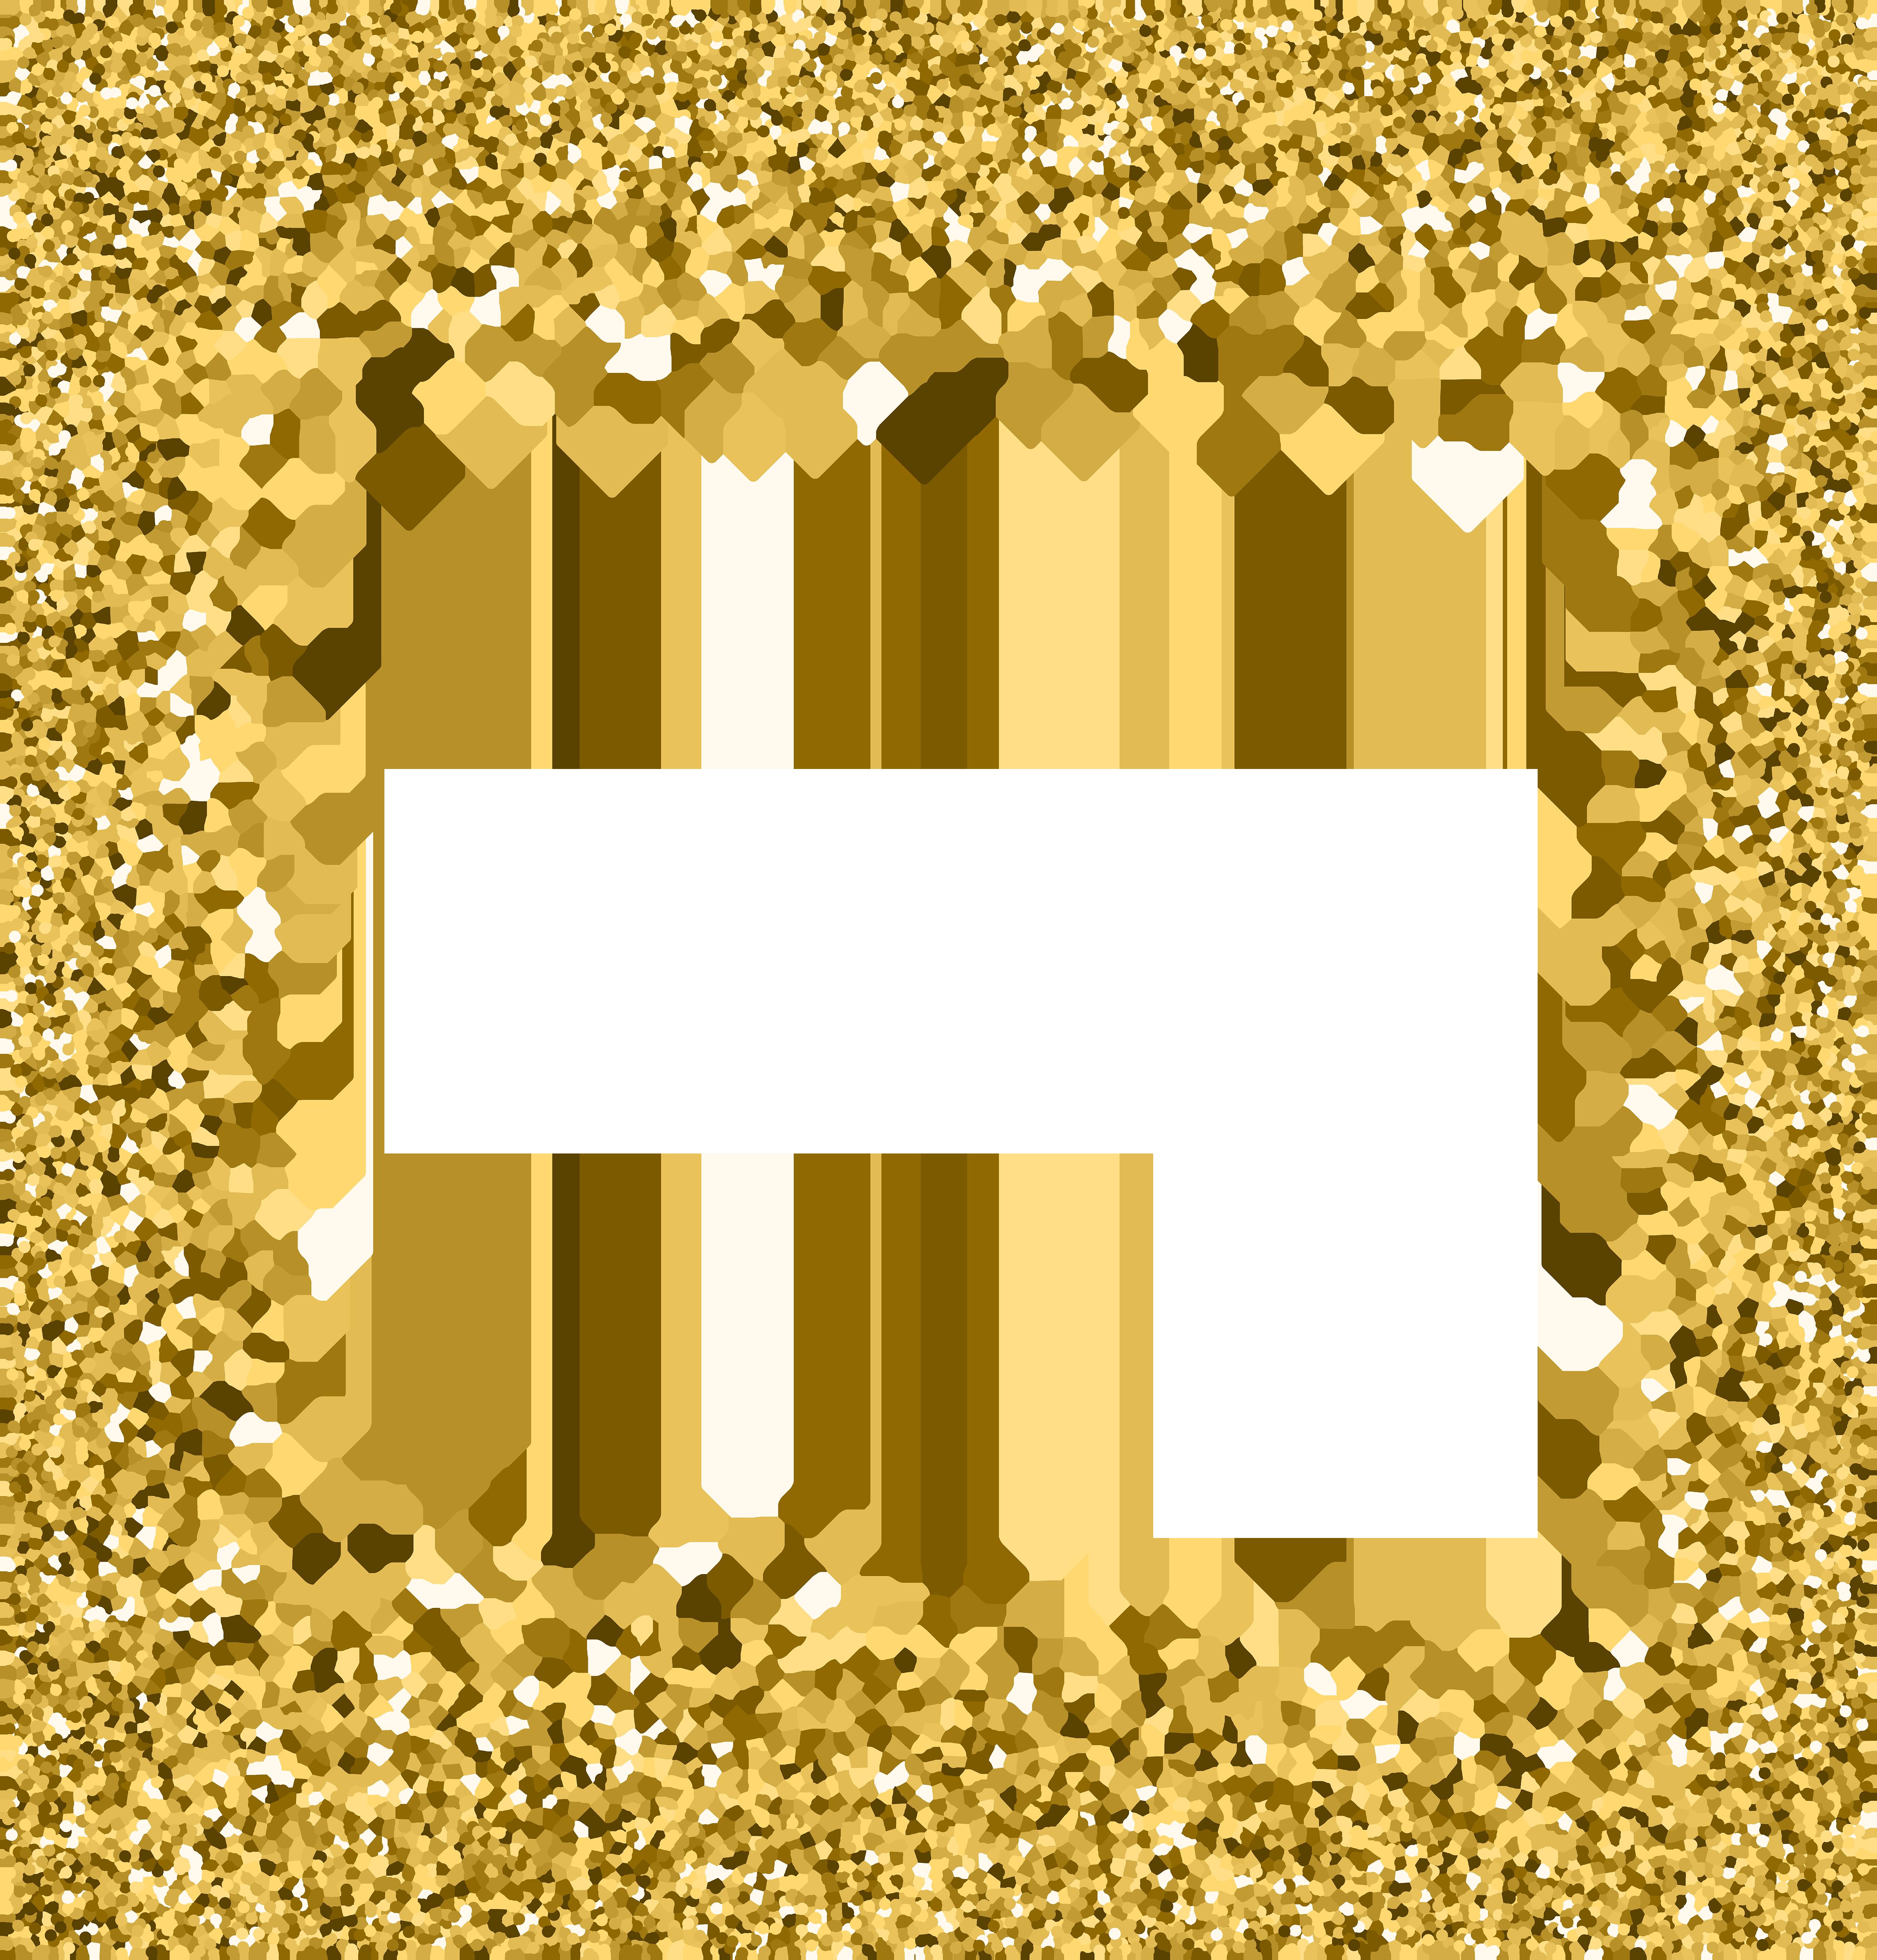 Https gallery yopriceville com. Gold glitter border png